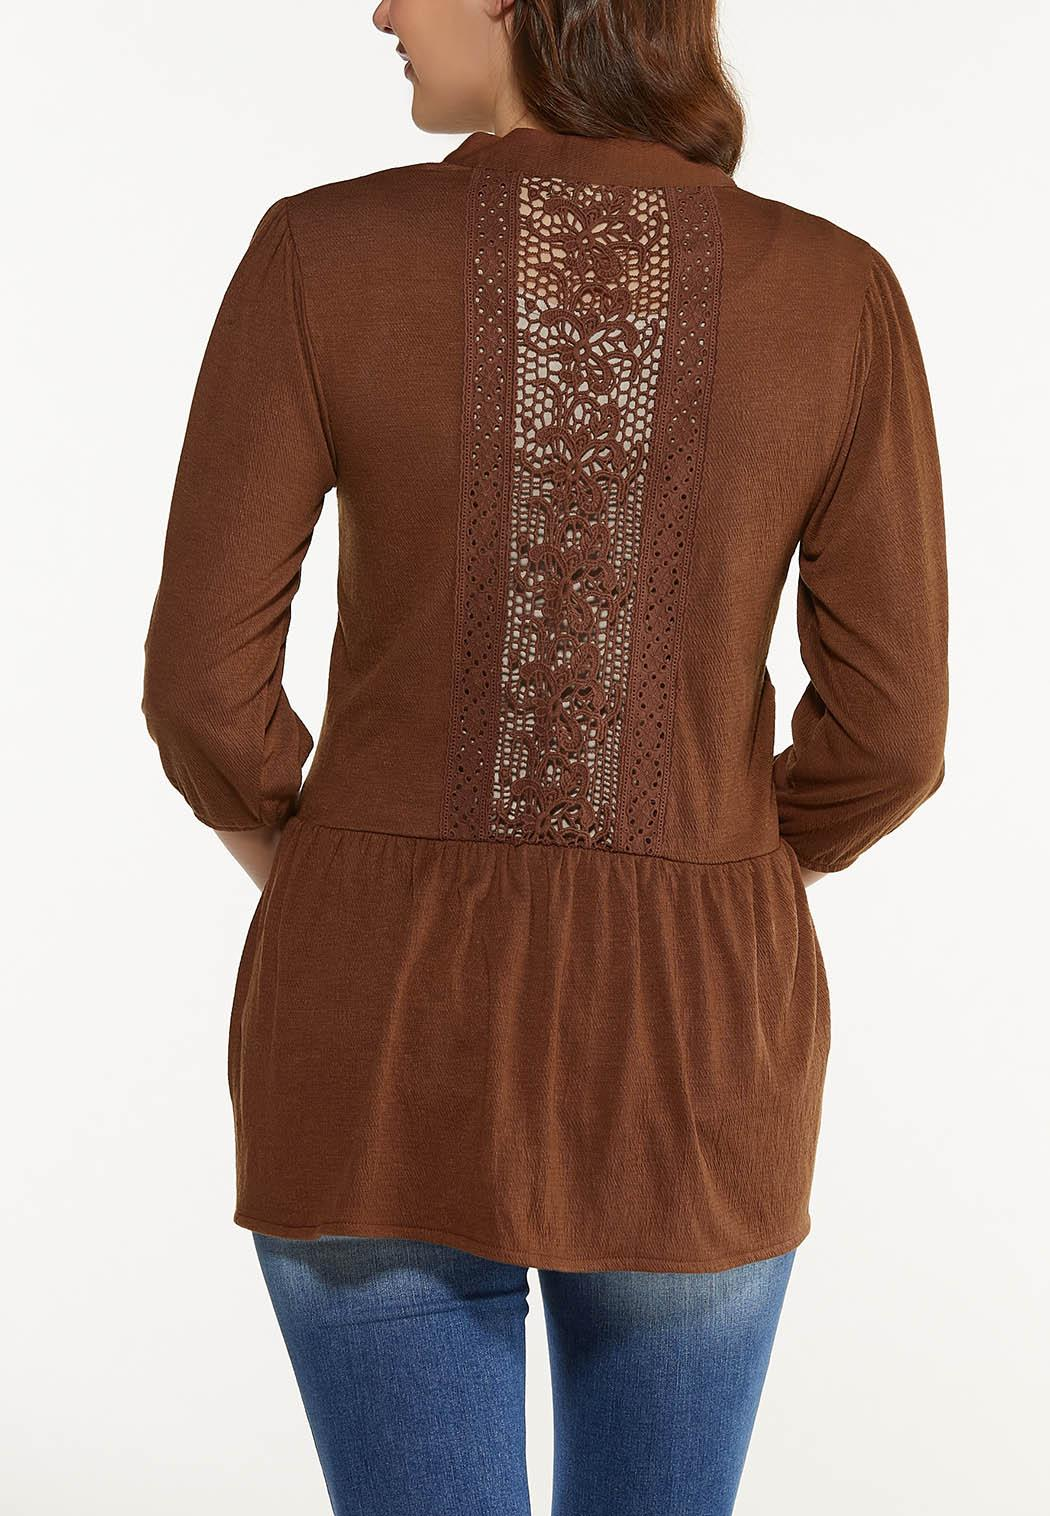 Plus Size Brown Crochet Cardigan (Item #44556002)